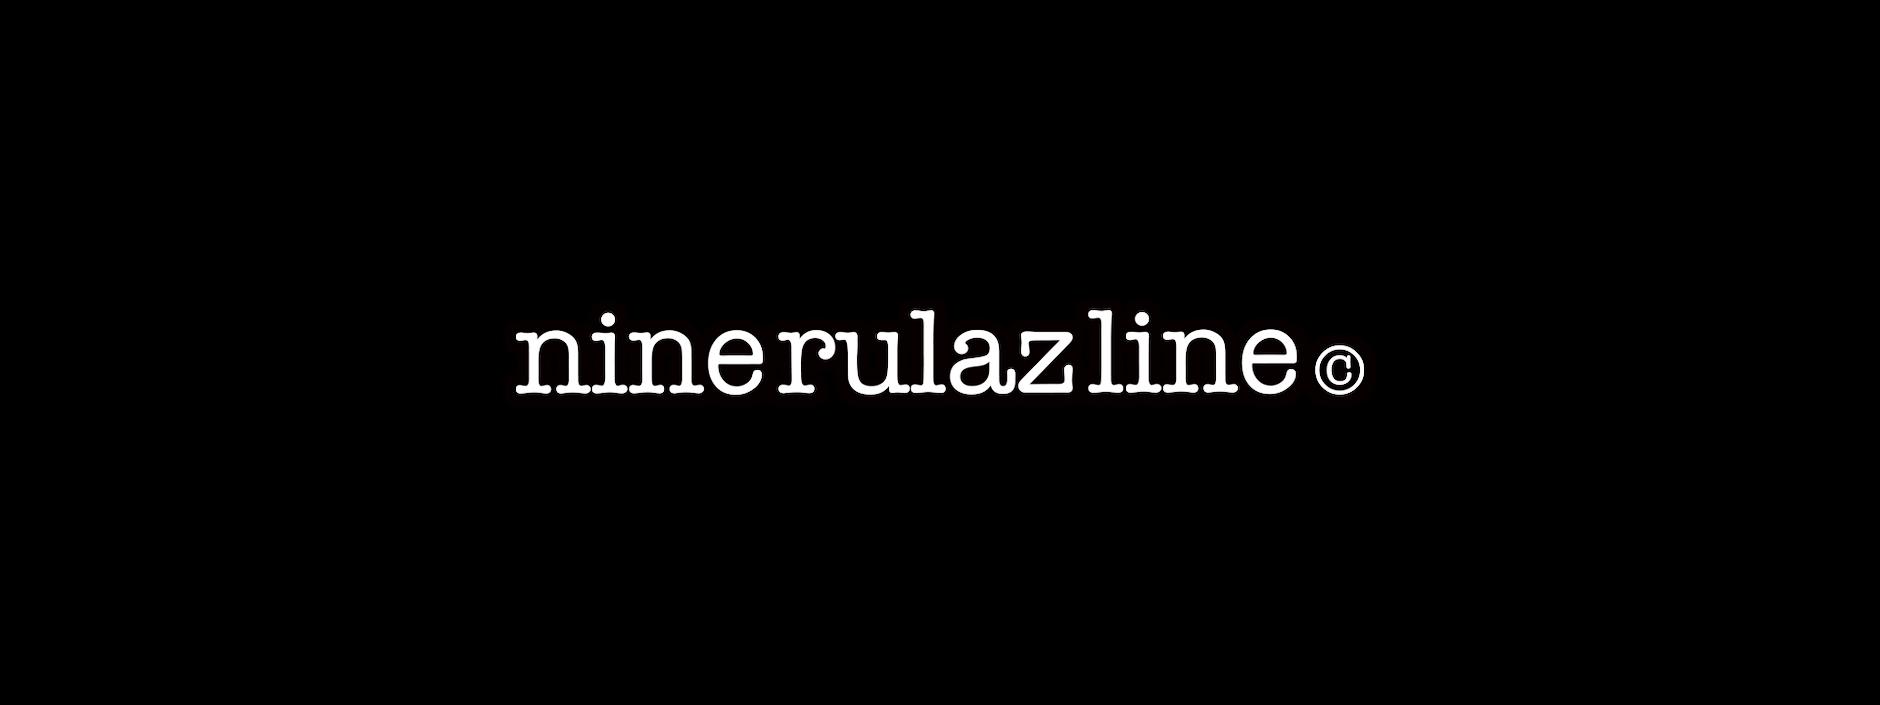 NINE RULAZ LINE